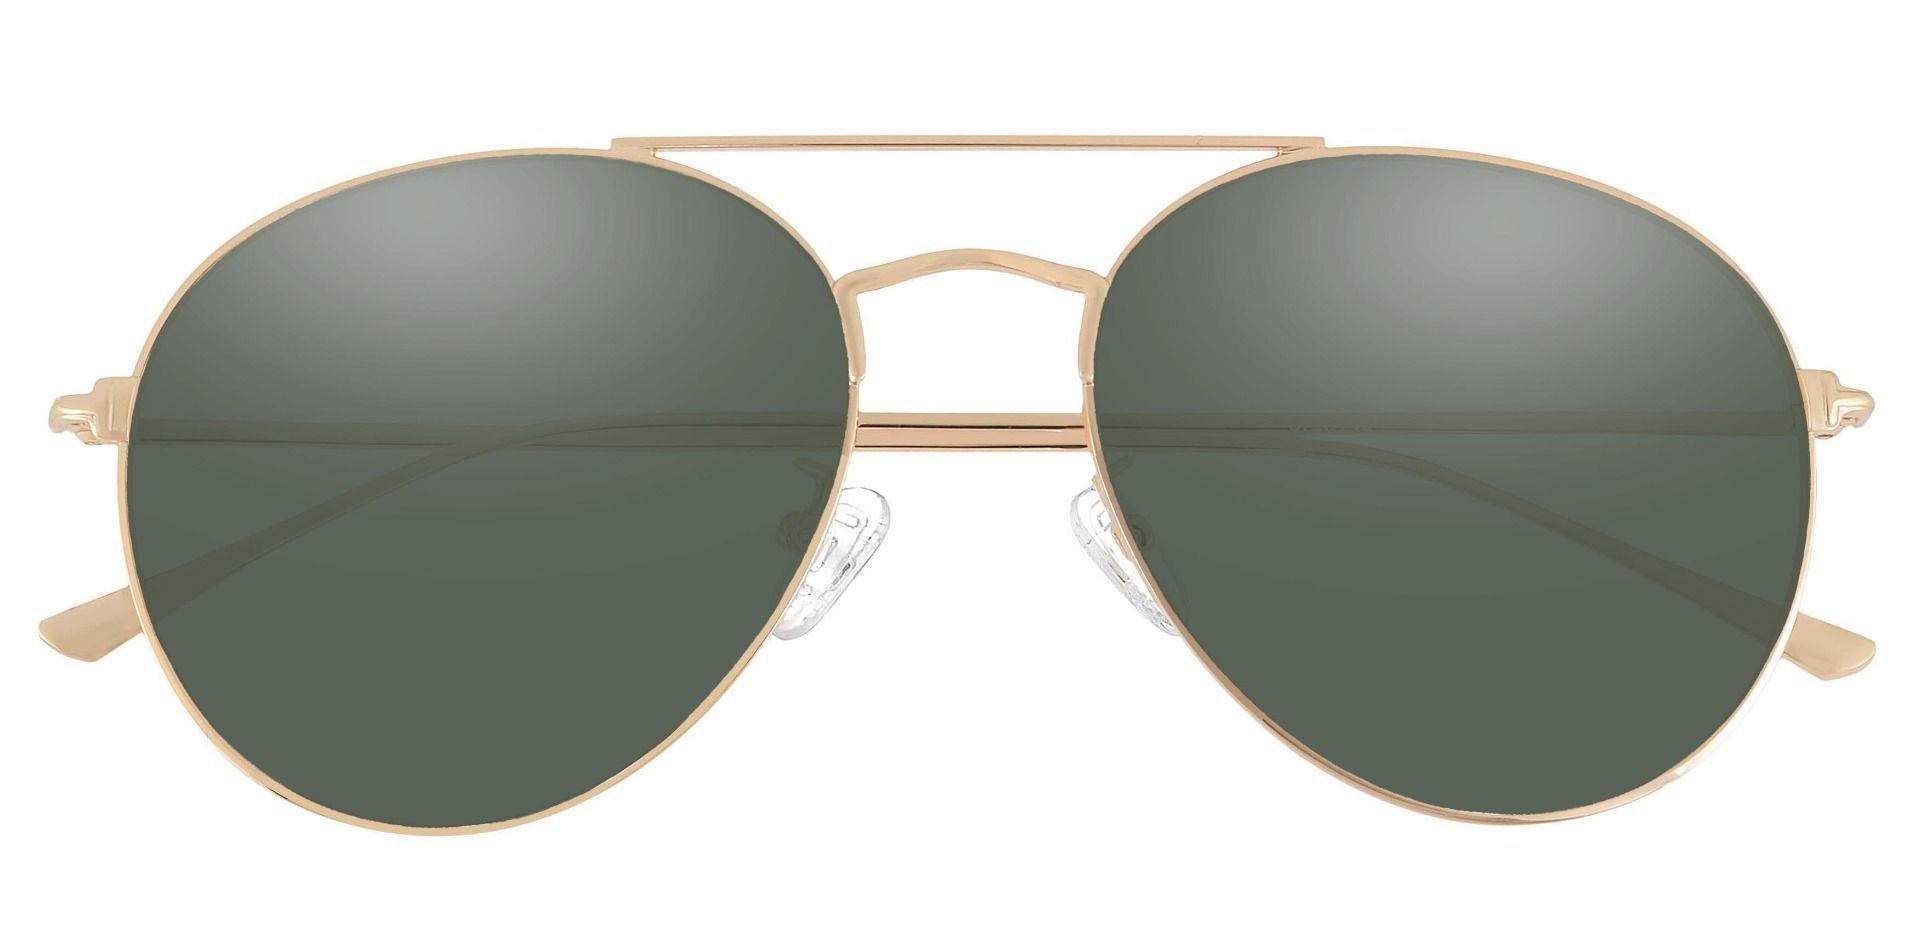 Canon Aviator Reading Sunglasses - Gold Frame With Green Lenses